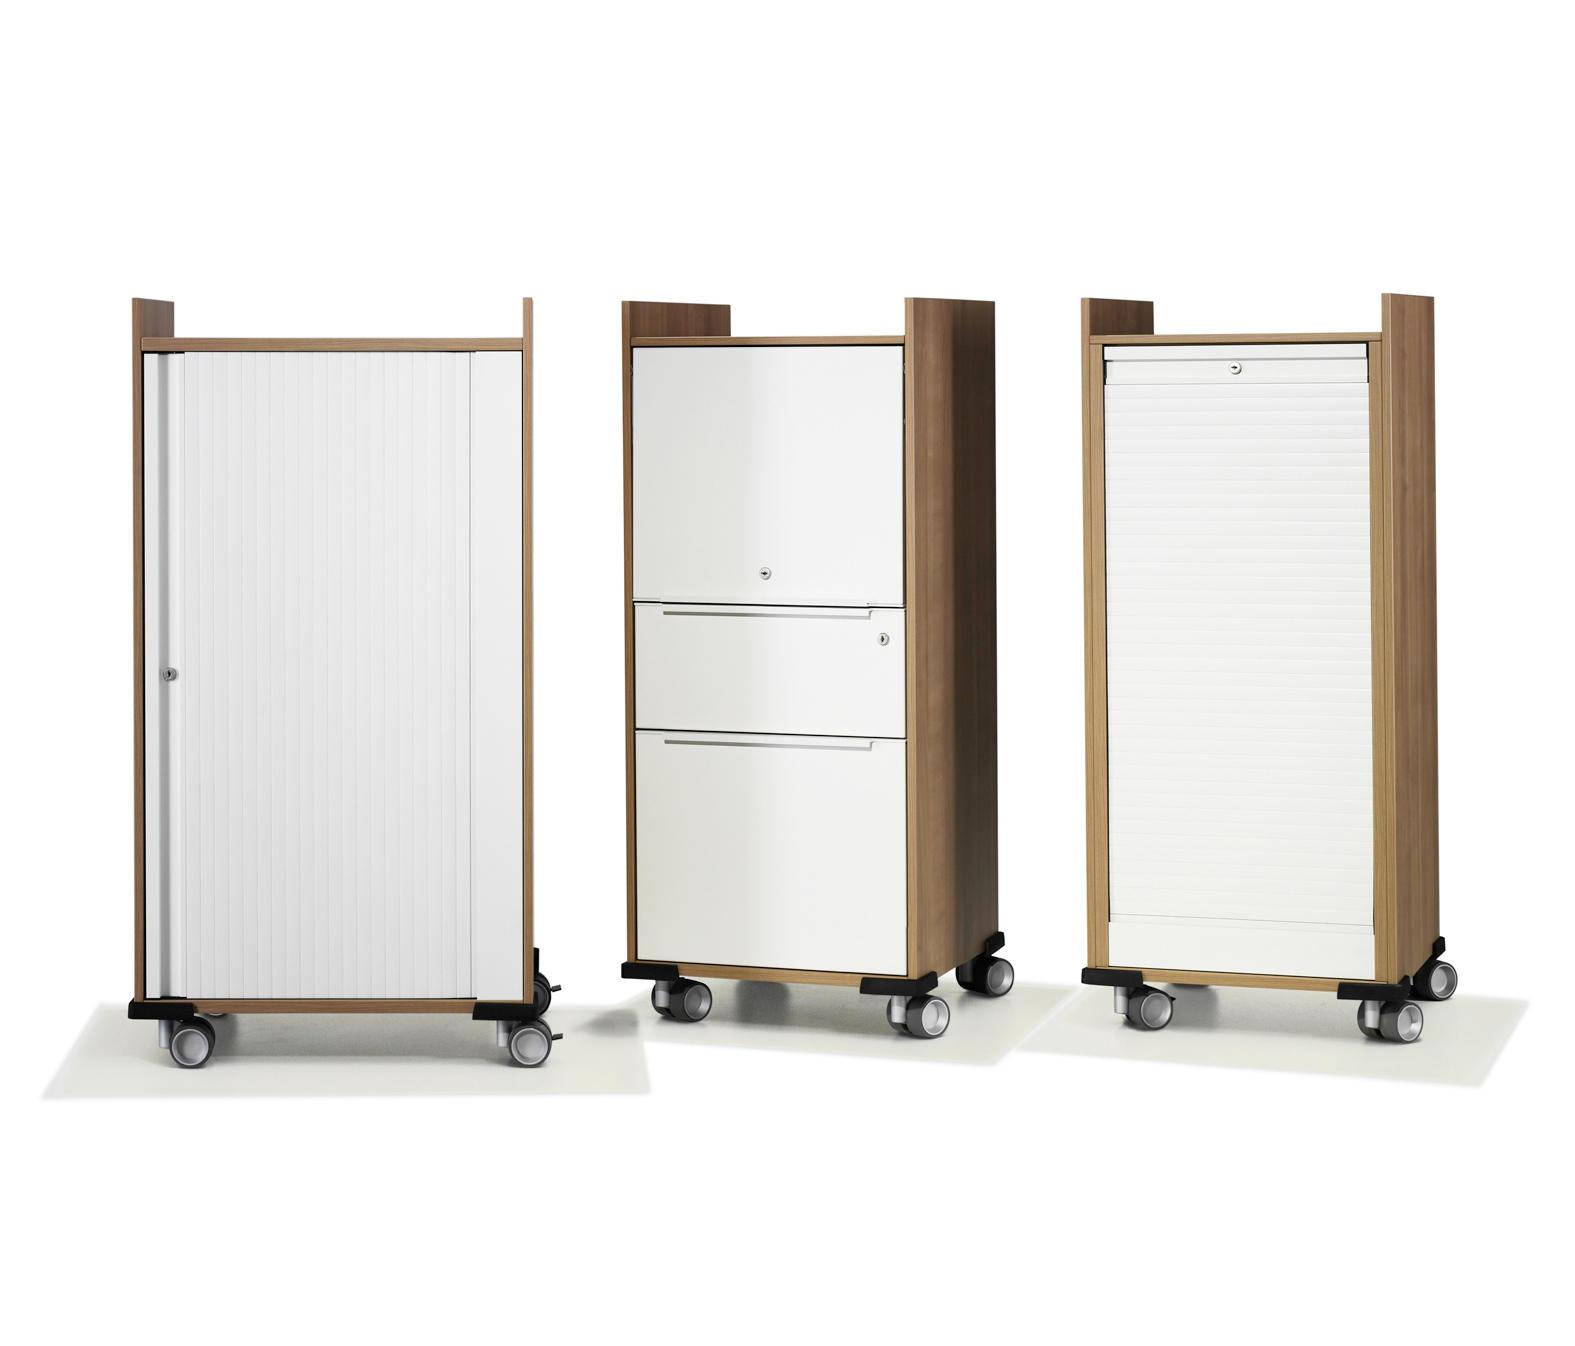 WINEA MAXX CADDY - Beistellcontainer von WINI Büromöbel | Architonic